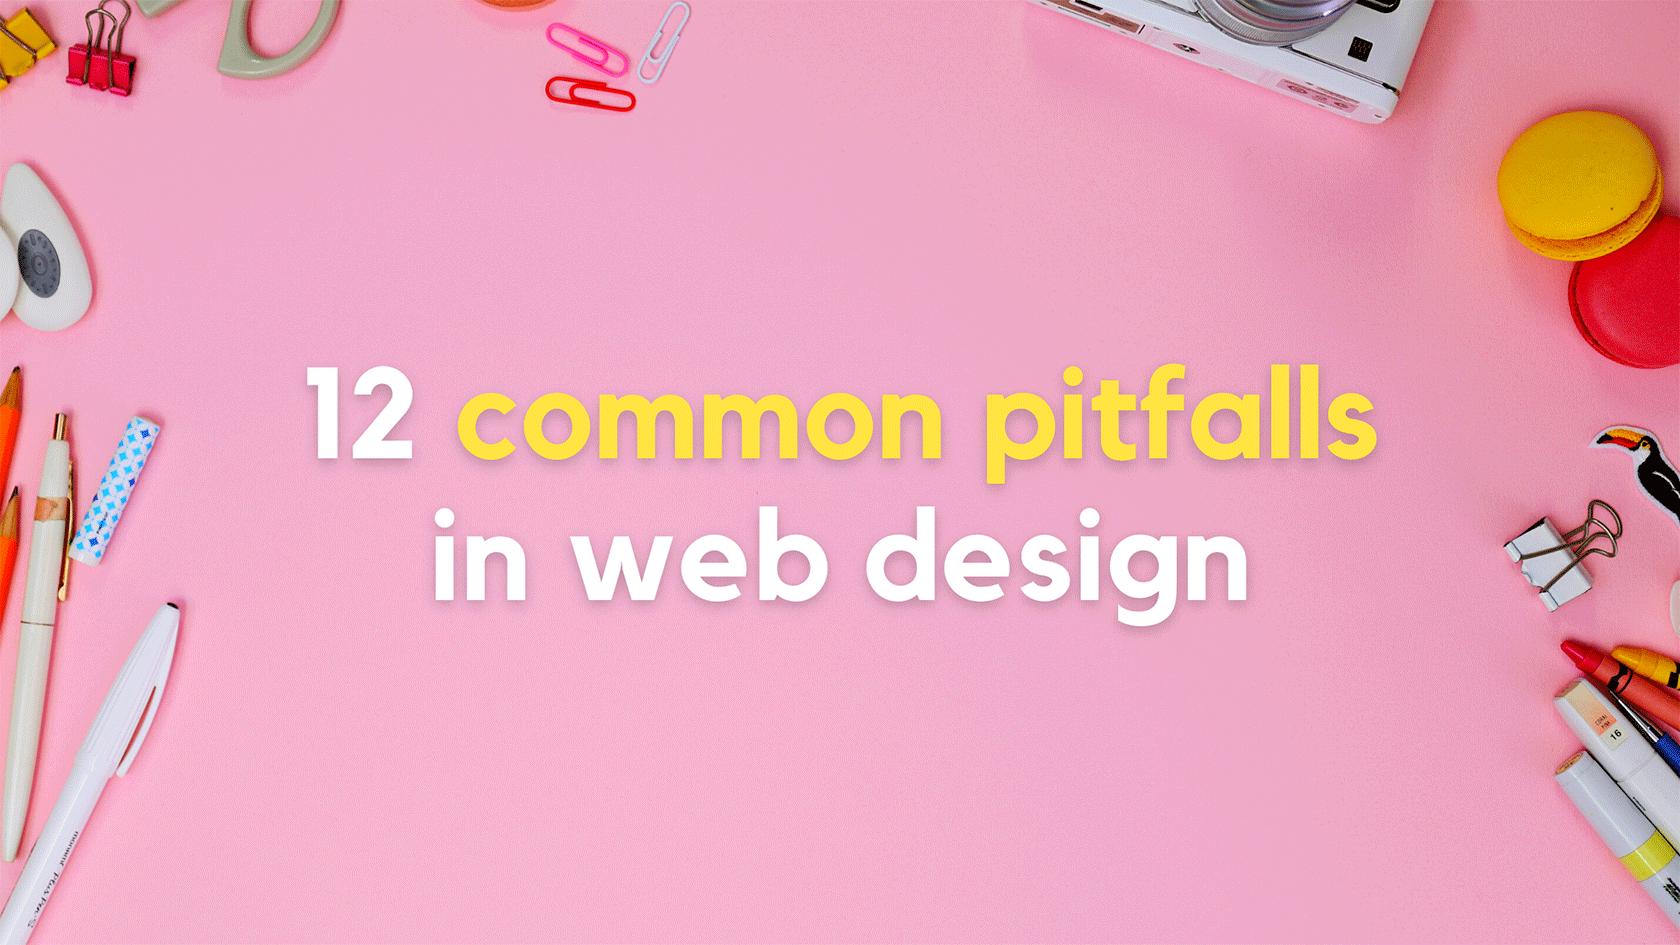 Pitfalls in Web Design